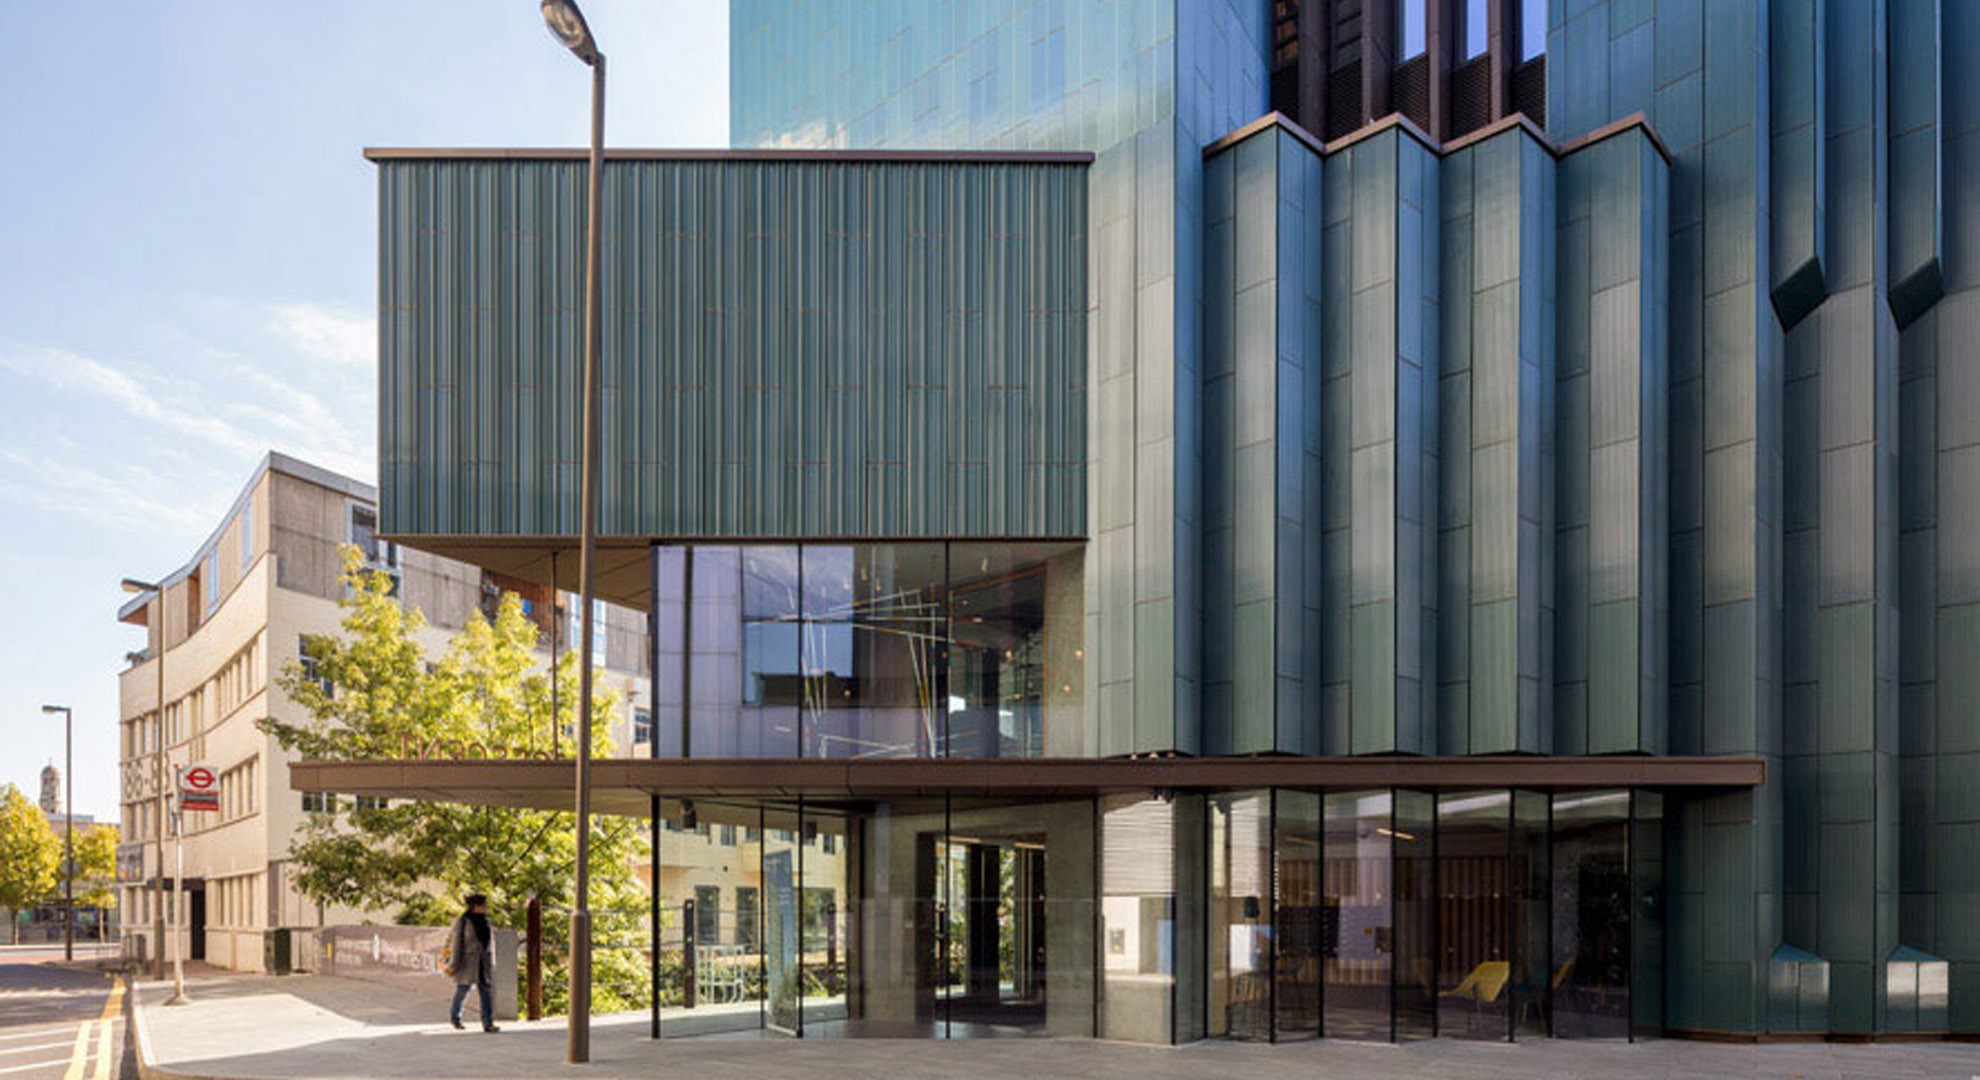 Metropolitan Workshop designs innovative modular housing